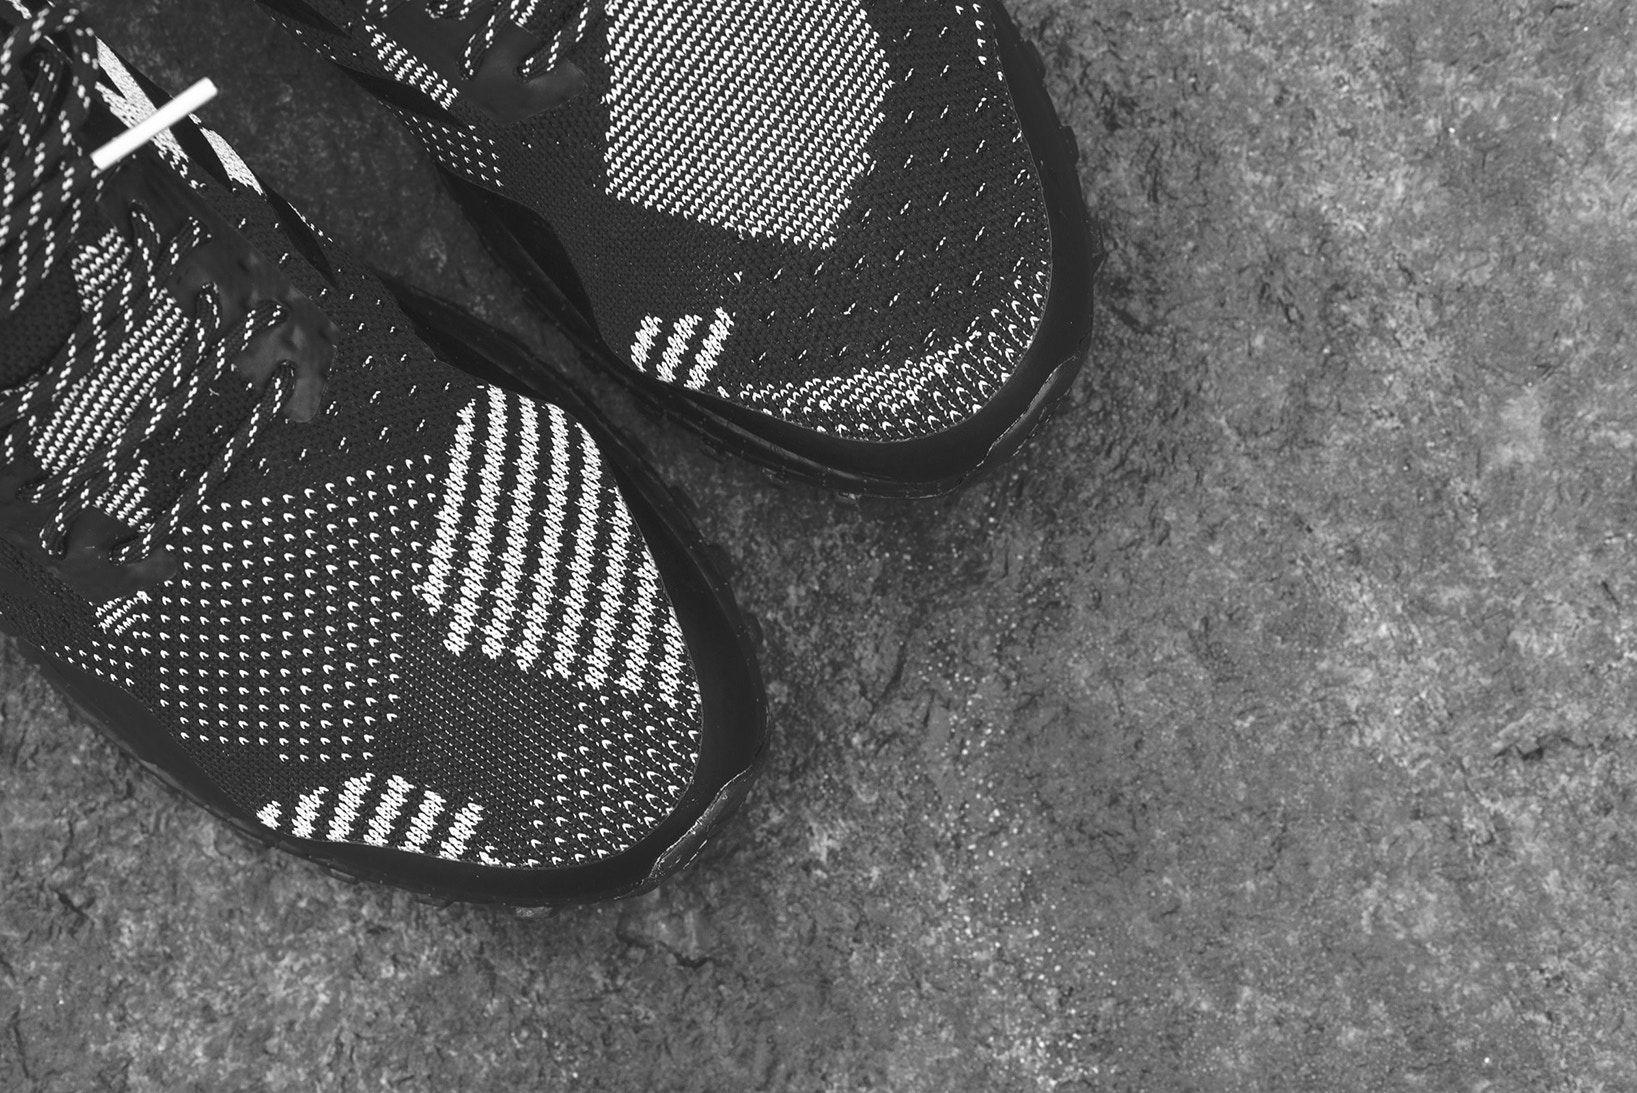 ac5d38279bc KITH nonnative adidas UltraBOOST Mid Consortium Twinstrike Originals  Collaboration Japan United Arrows webstore black patchwork 3m drop release  date info ...